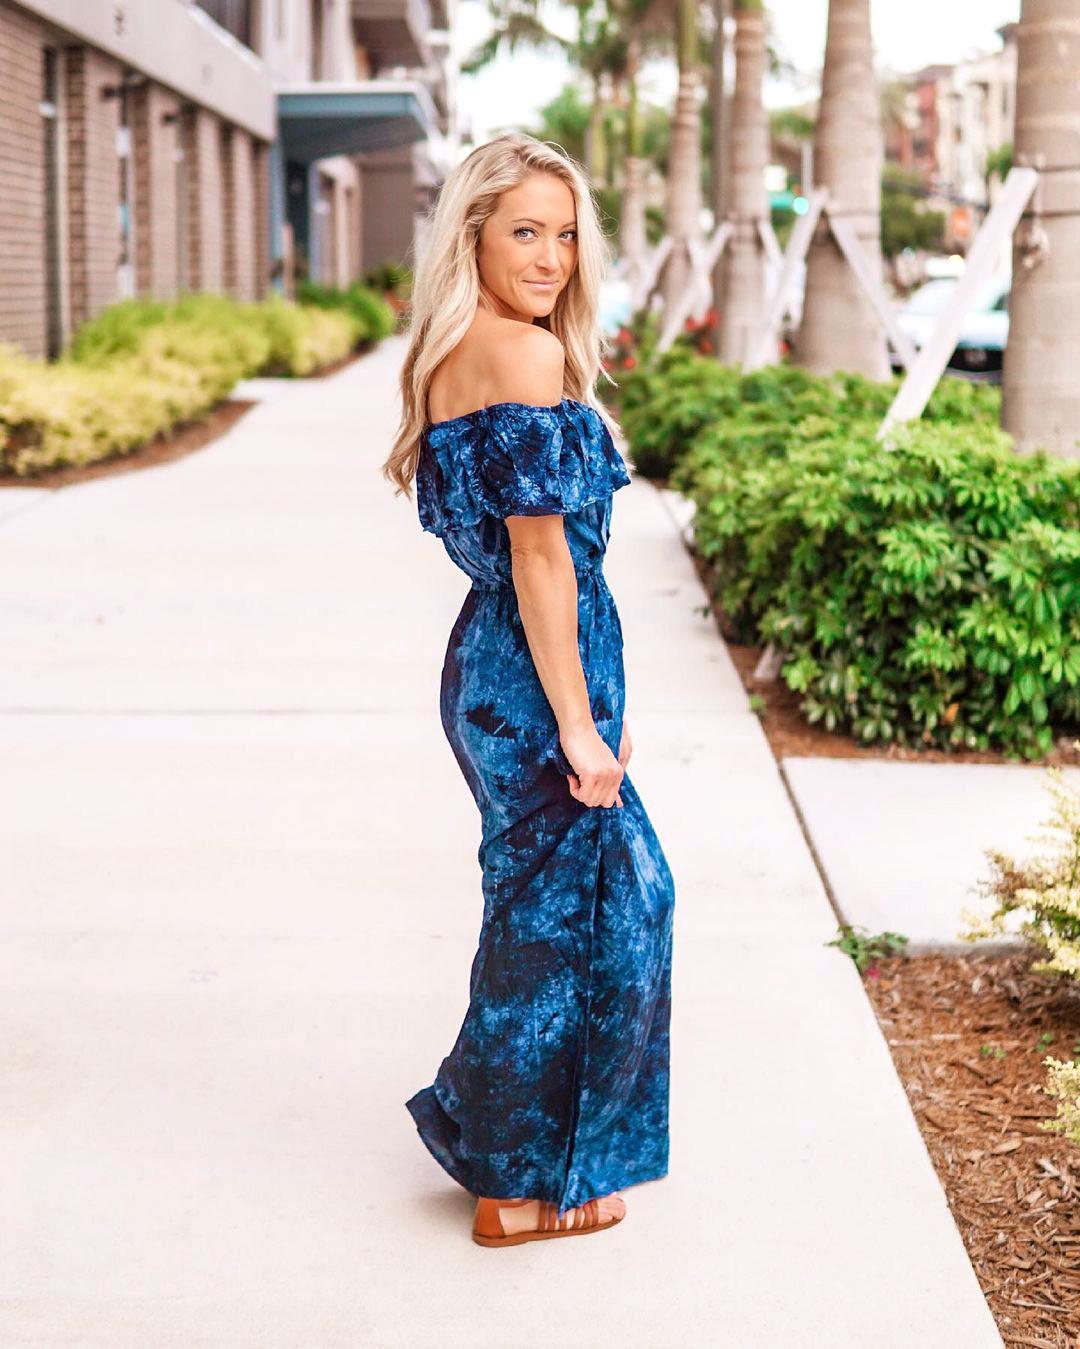 Woman in blue tie-dye maxi dress - Casual summer dress from women's fashion subscription box